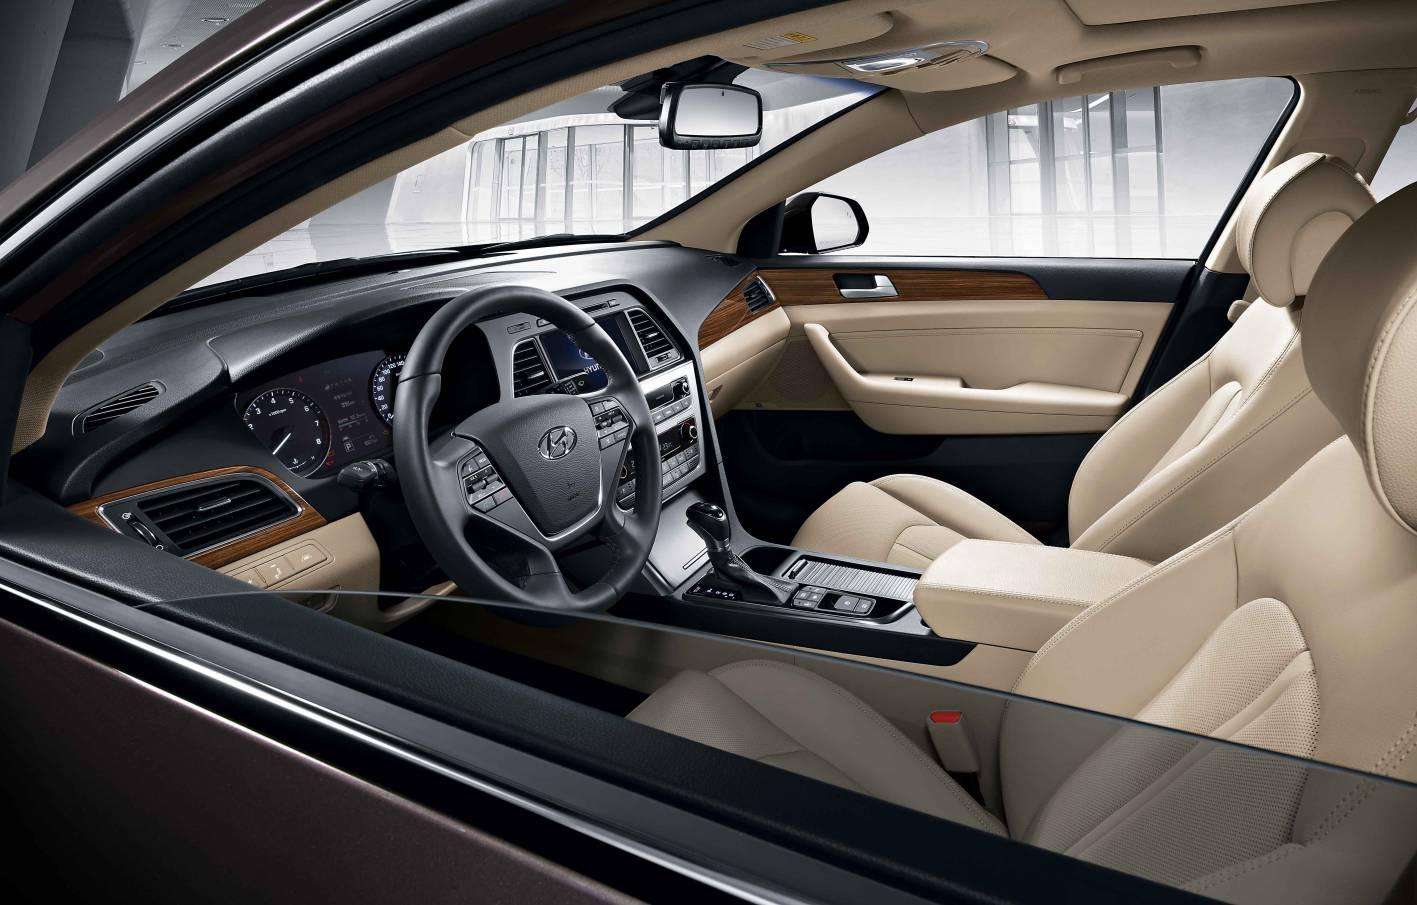 2014 Hyundai Sonata Interior